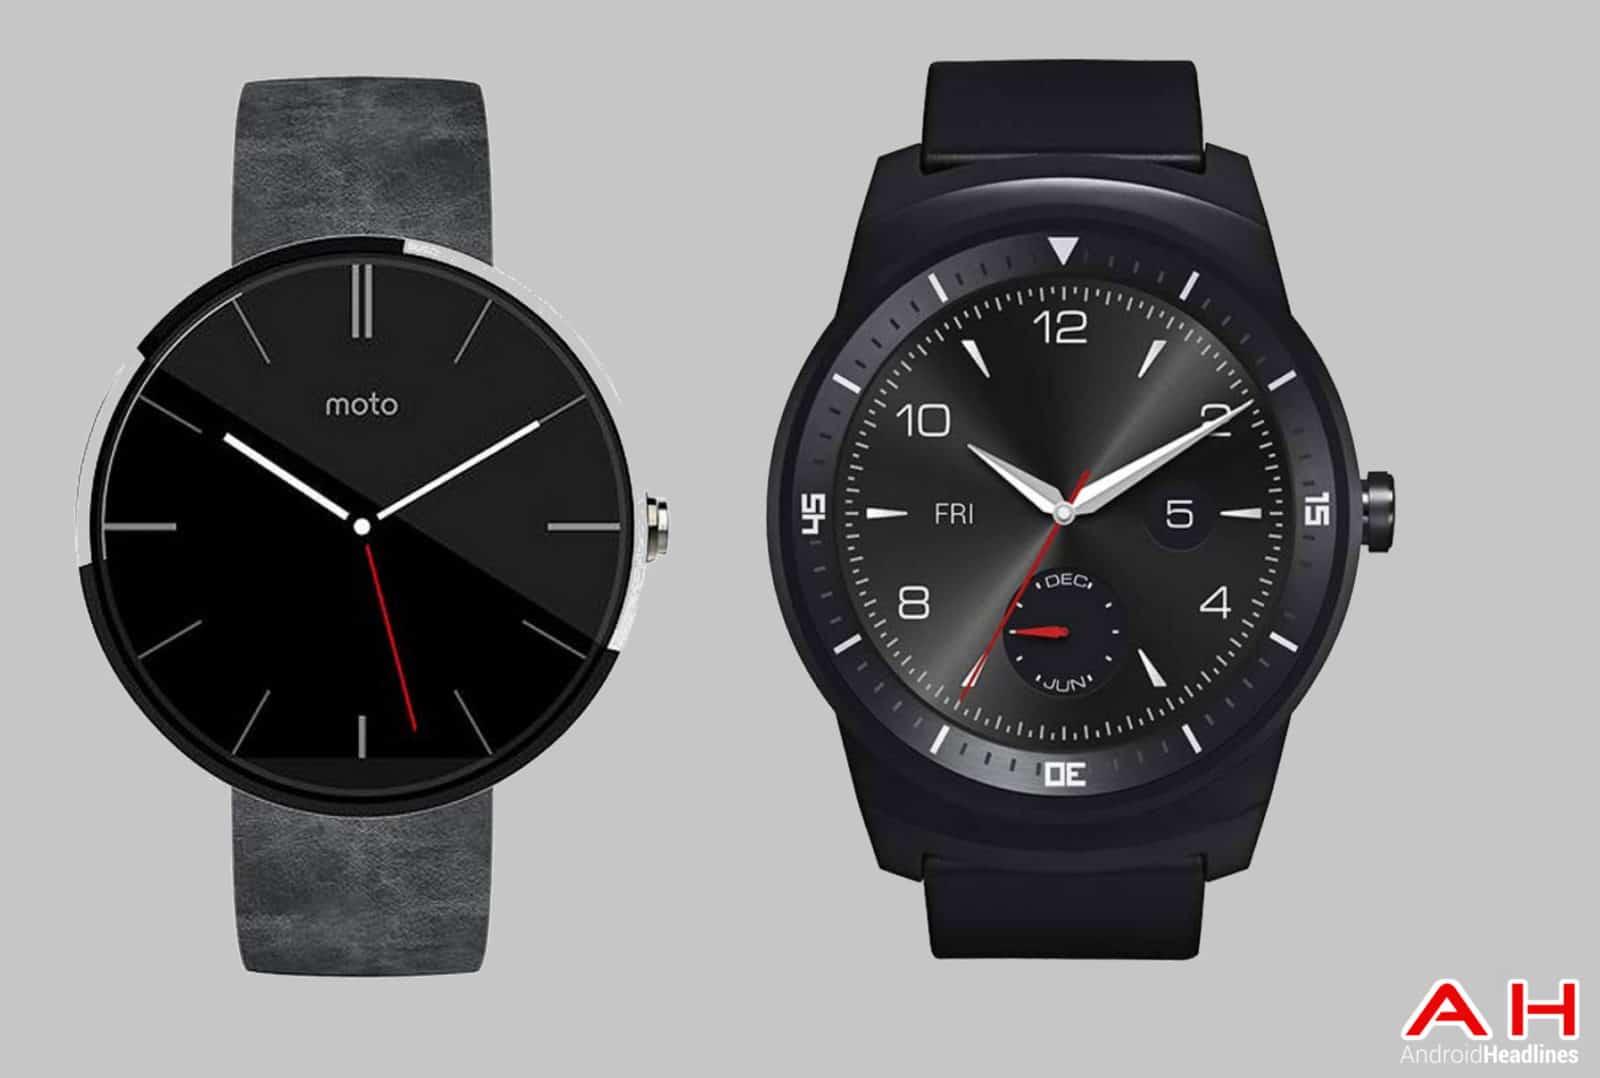 Moto 360 vs LG G Watch R cam AH